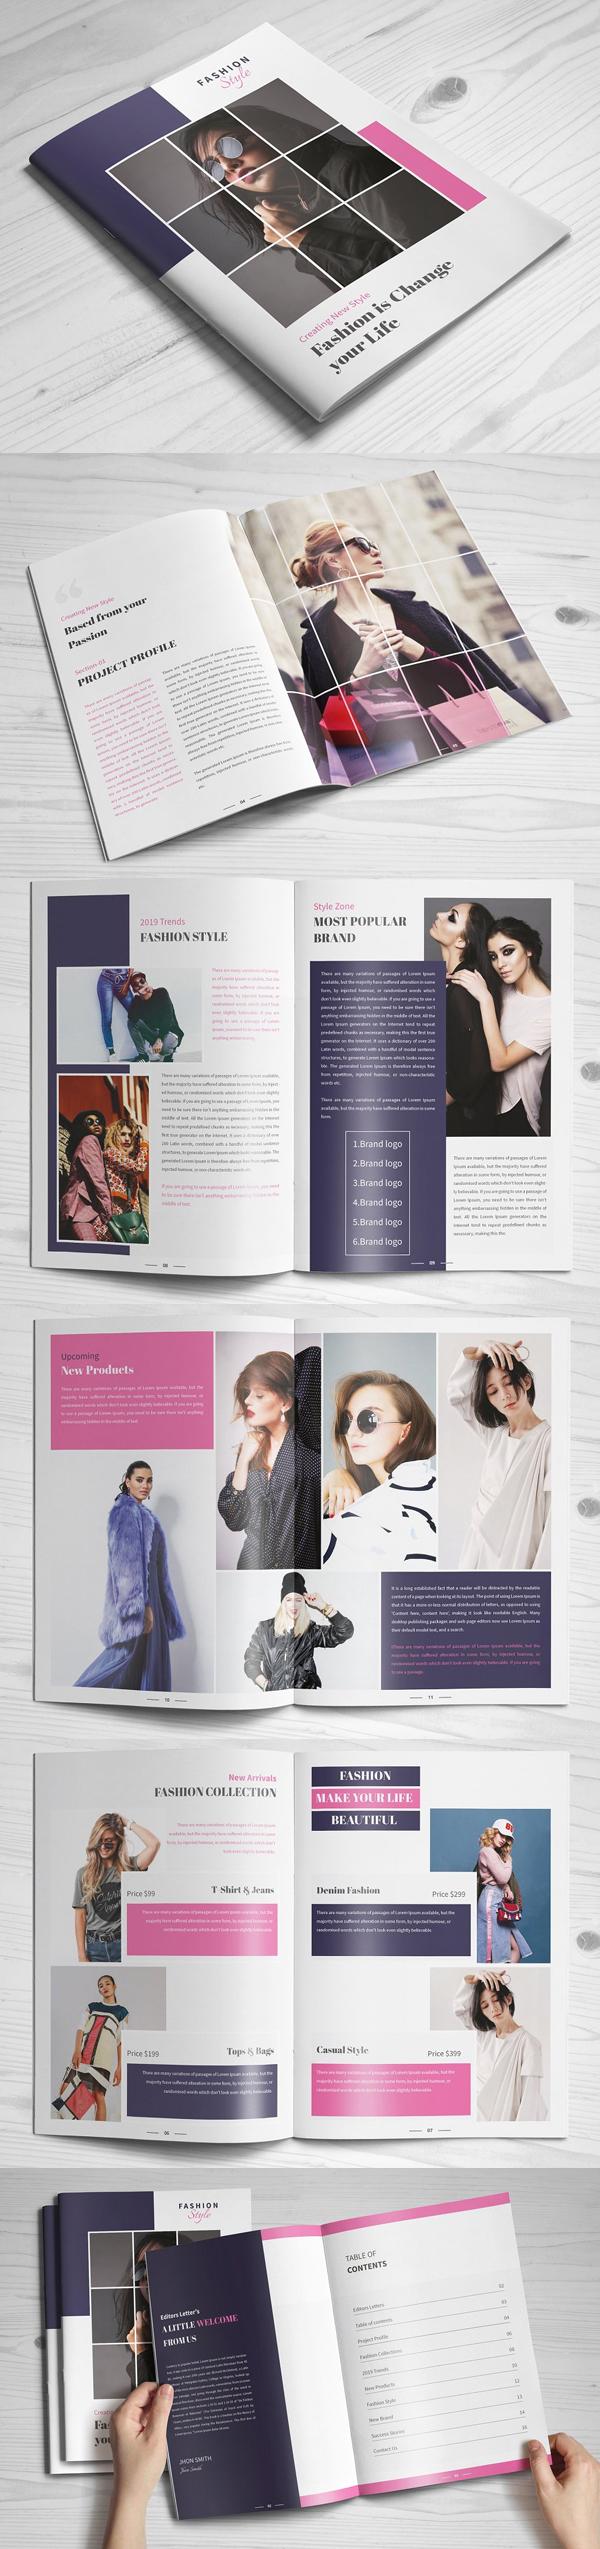 Modern Fashion Brochure Template